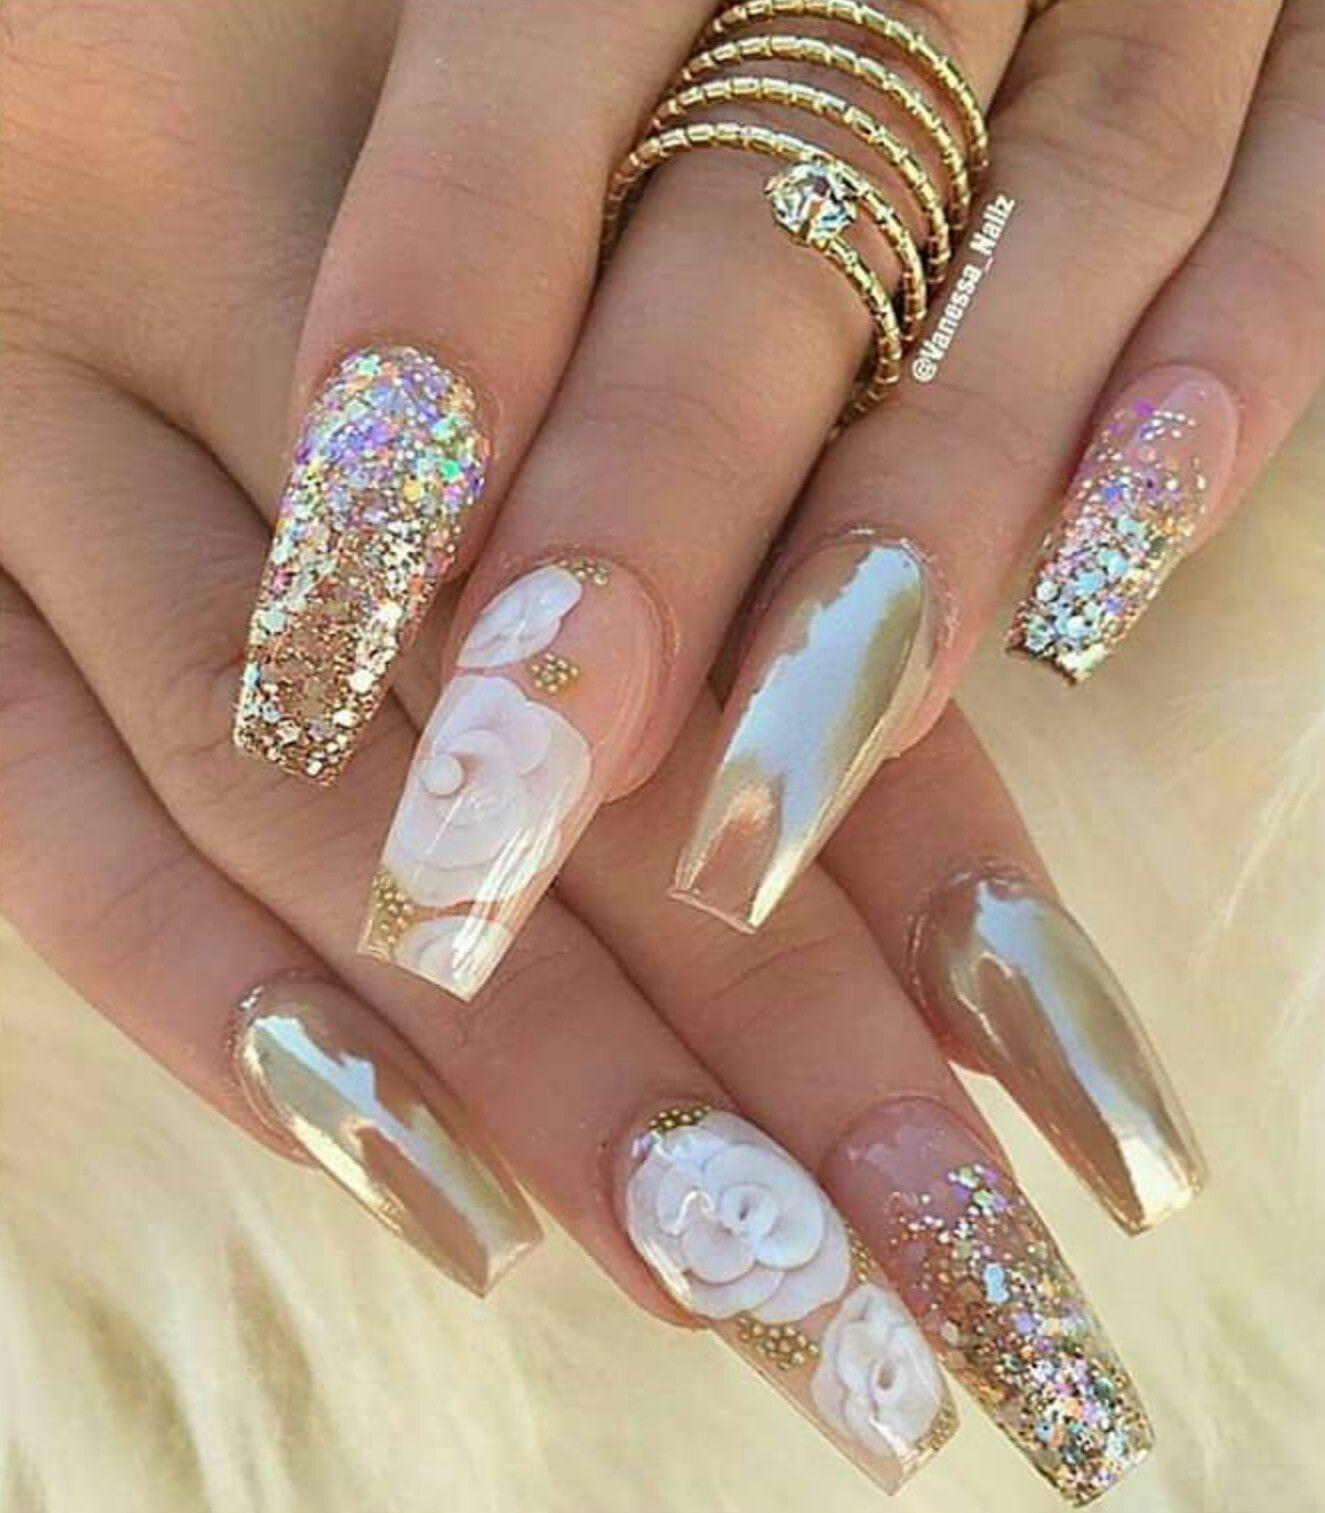 I Really Like These Nails Pinterest Uña Decoradas Uña